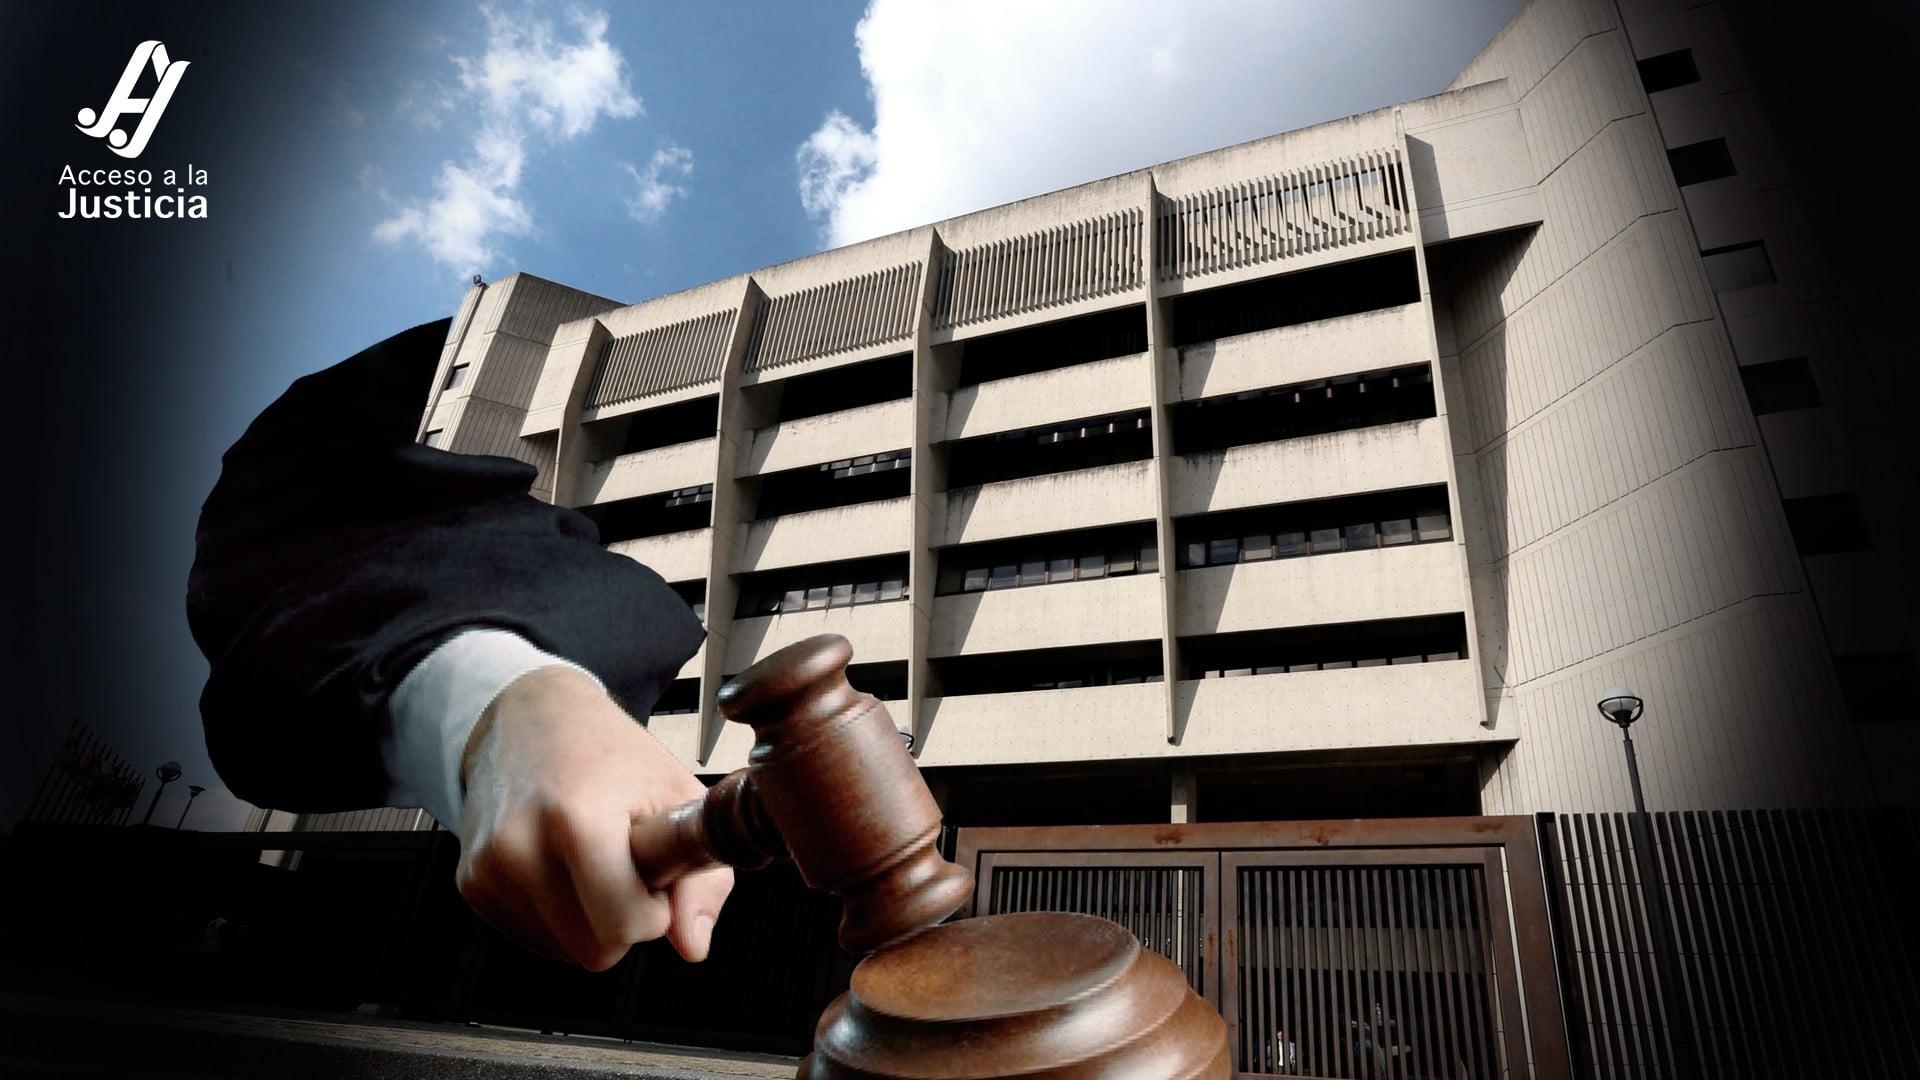 La Sala Constitucional realiza precisiones sobre el delito flagrante